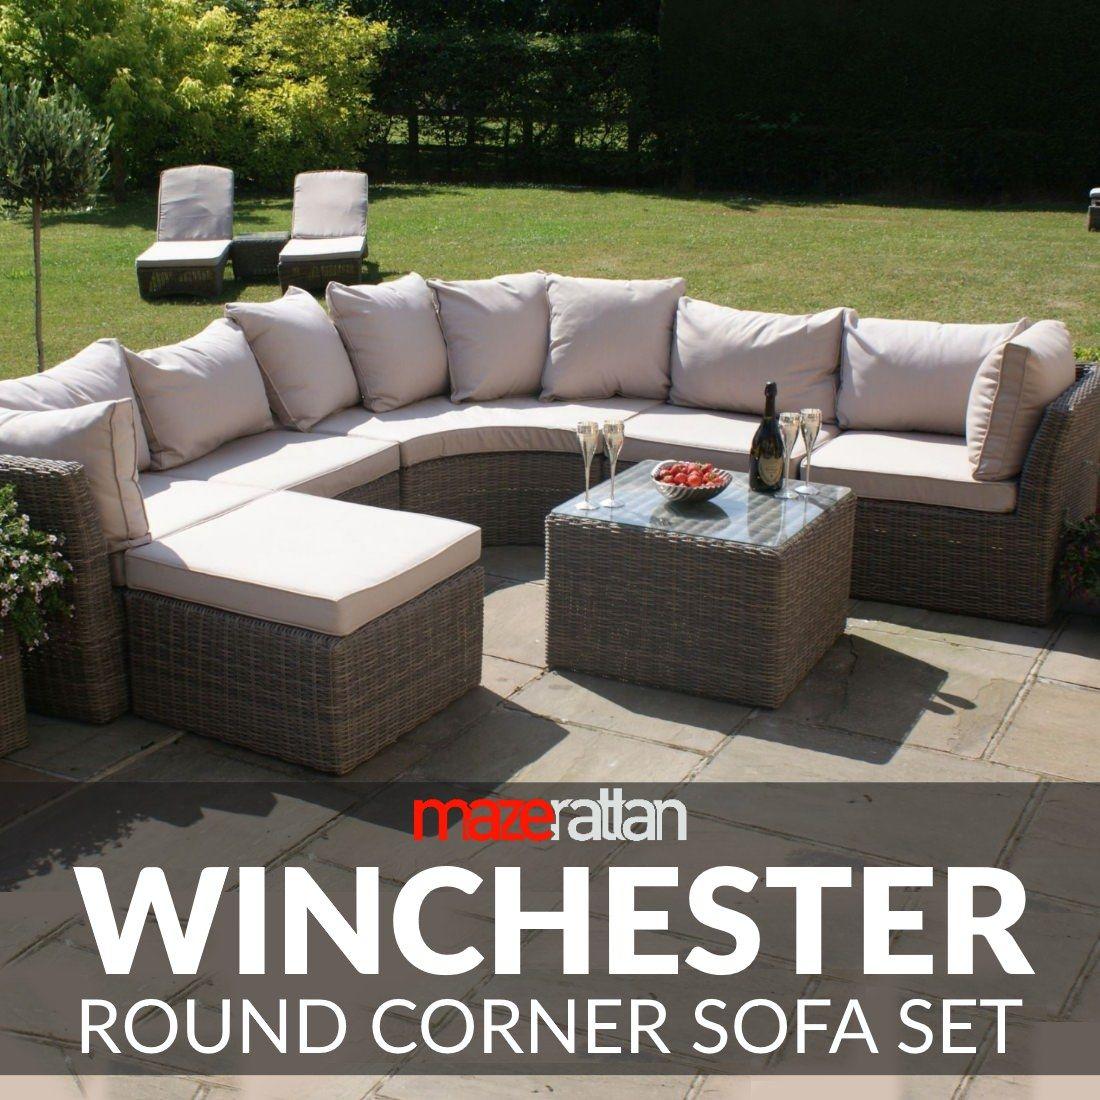 Maze Rattan Winchester Round Corner Sofa Set WIN-203034 - Maze Rattan Winchester Round Corner Sofa Set WIN-203034 Rattan